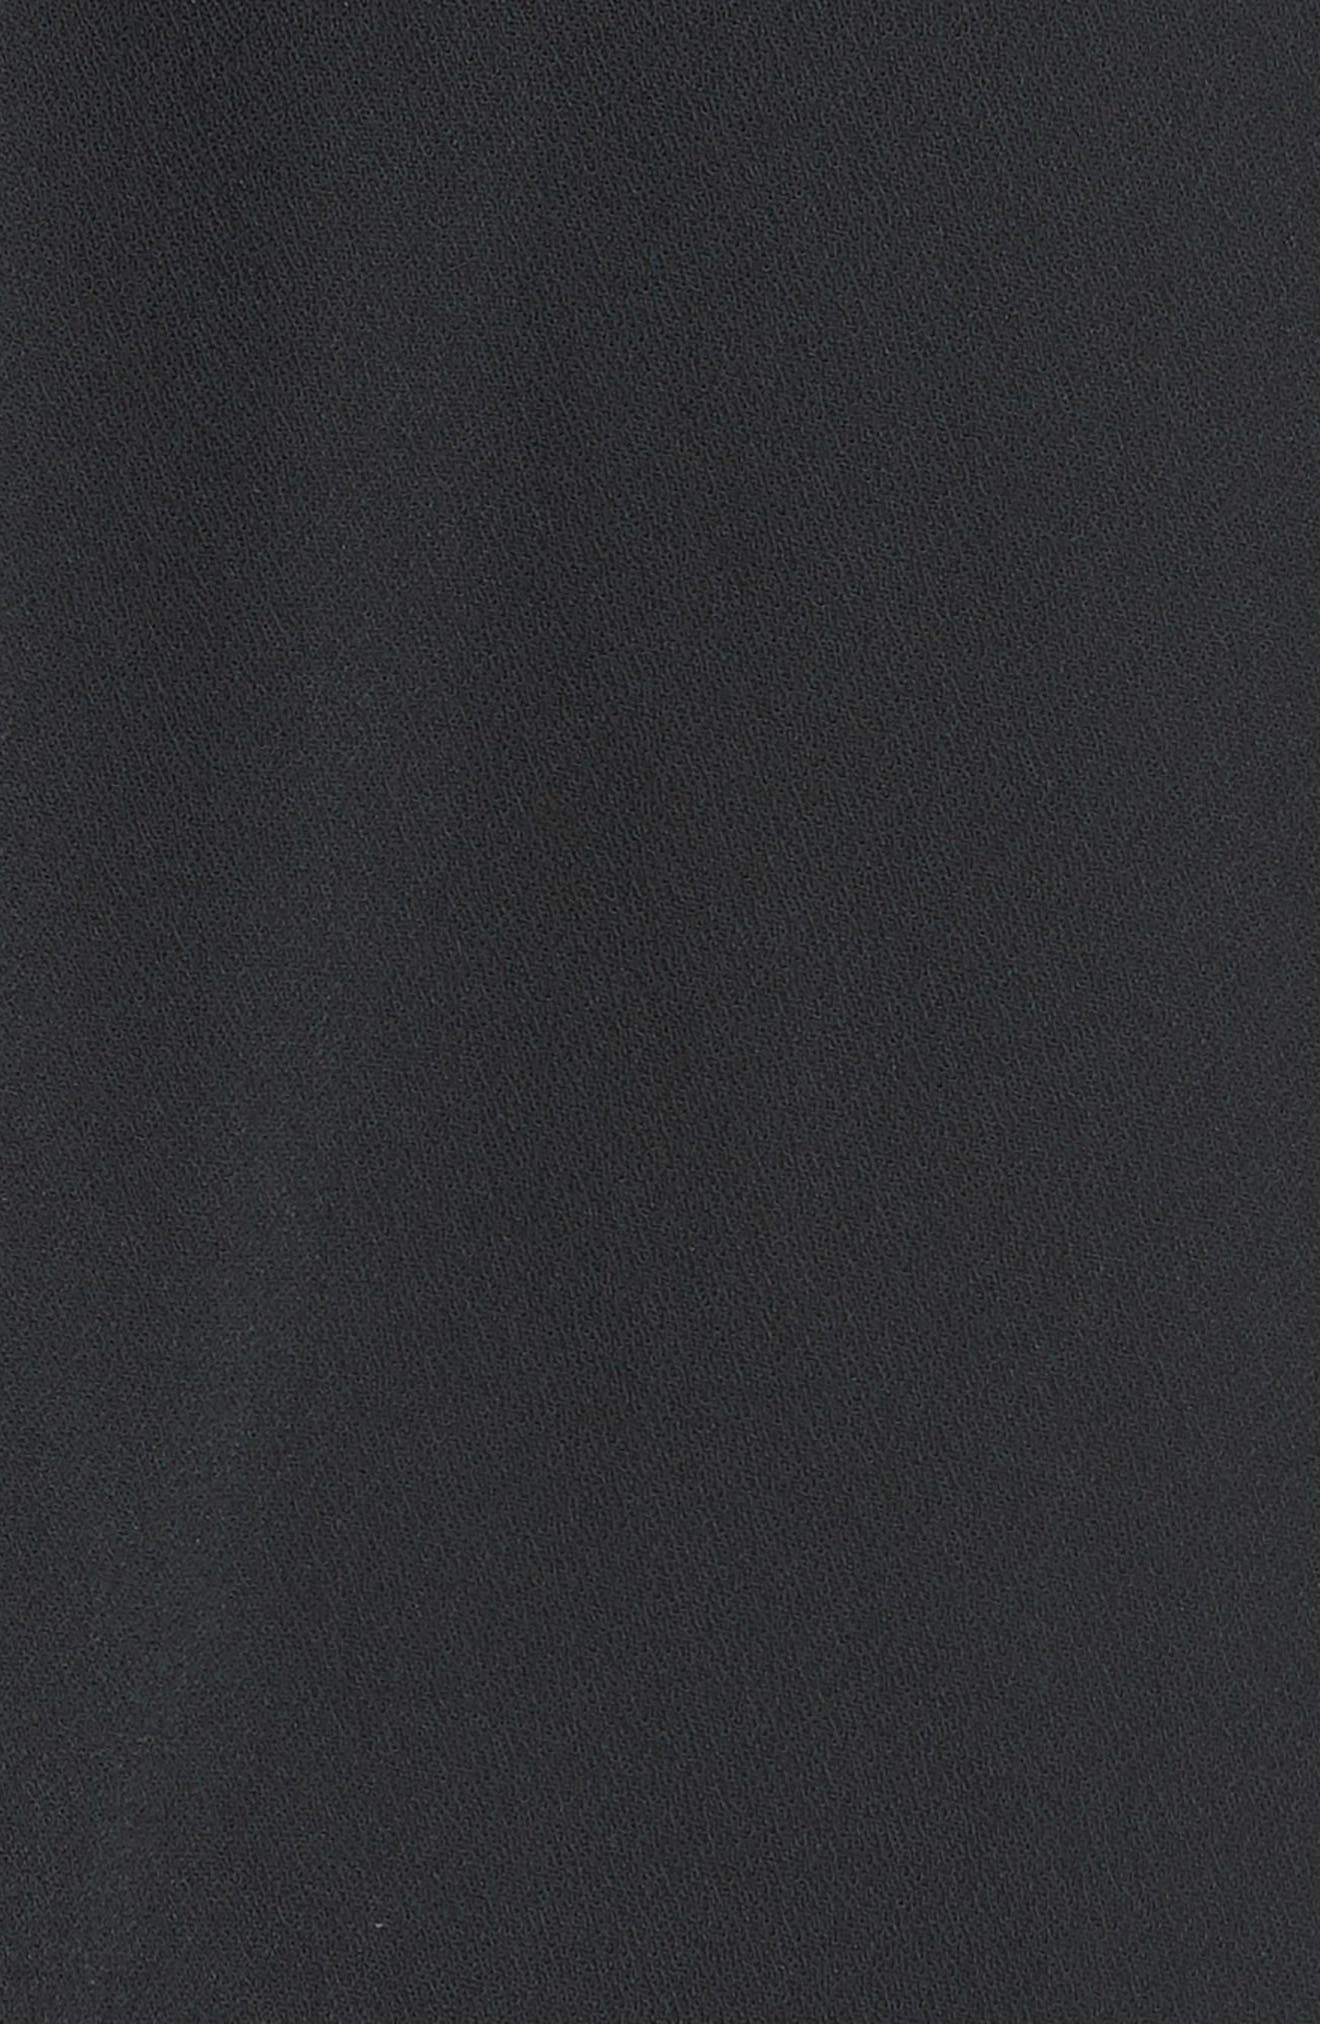 Structured Lace Cold Shoulder Midi Dress,                             Alternate thumbnail 5, color,                             Black